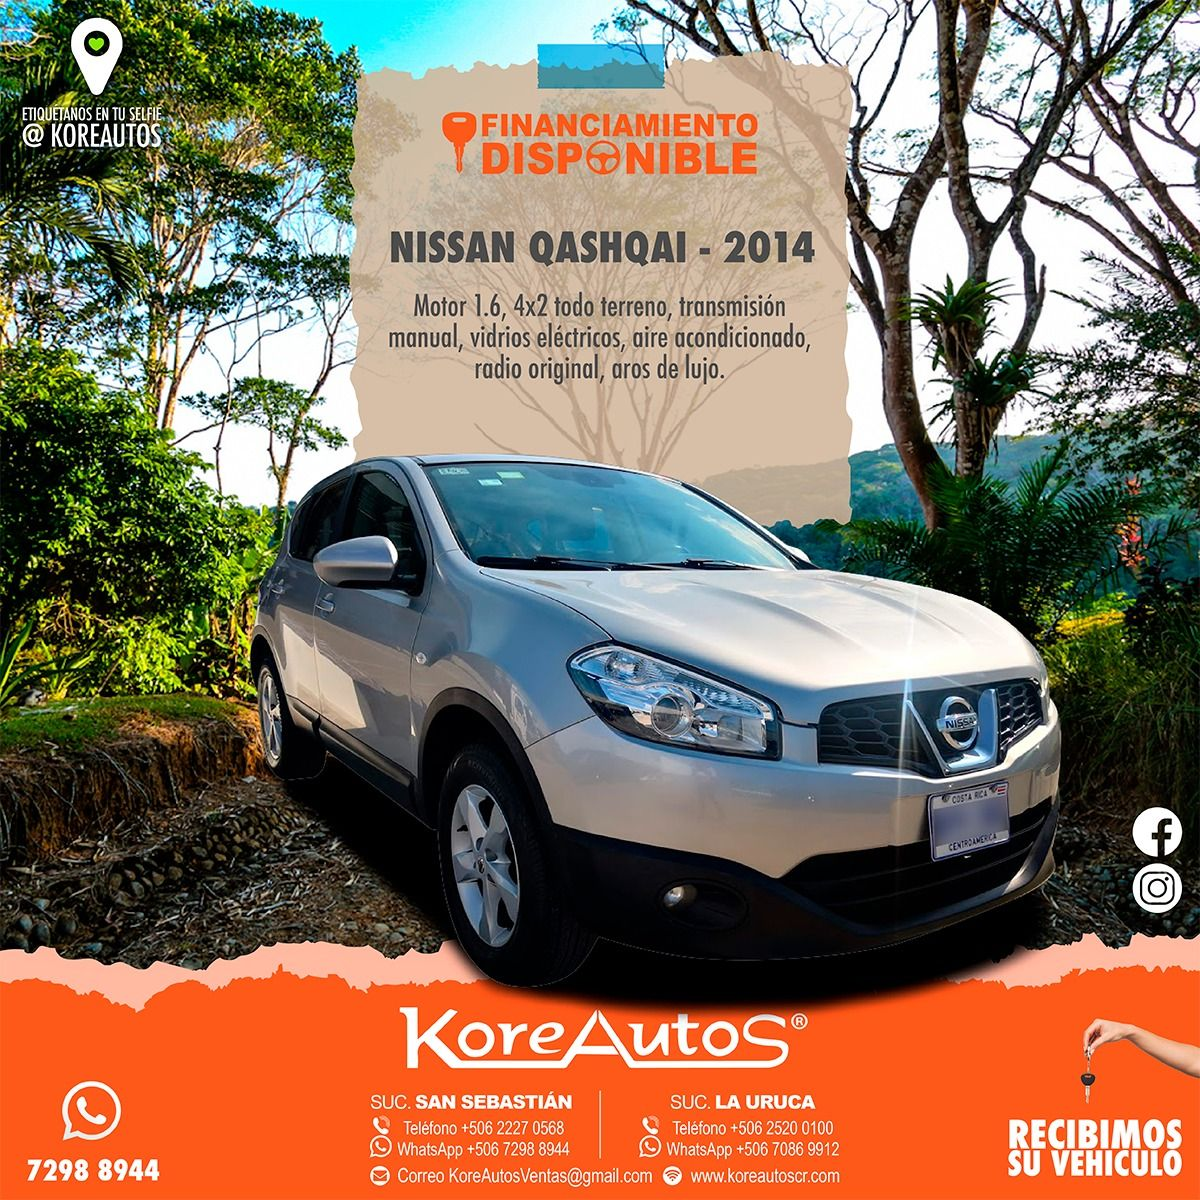 Nissan Nissan, Nissan qashqai, Vehicles